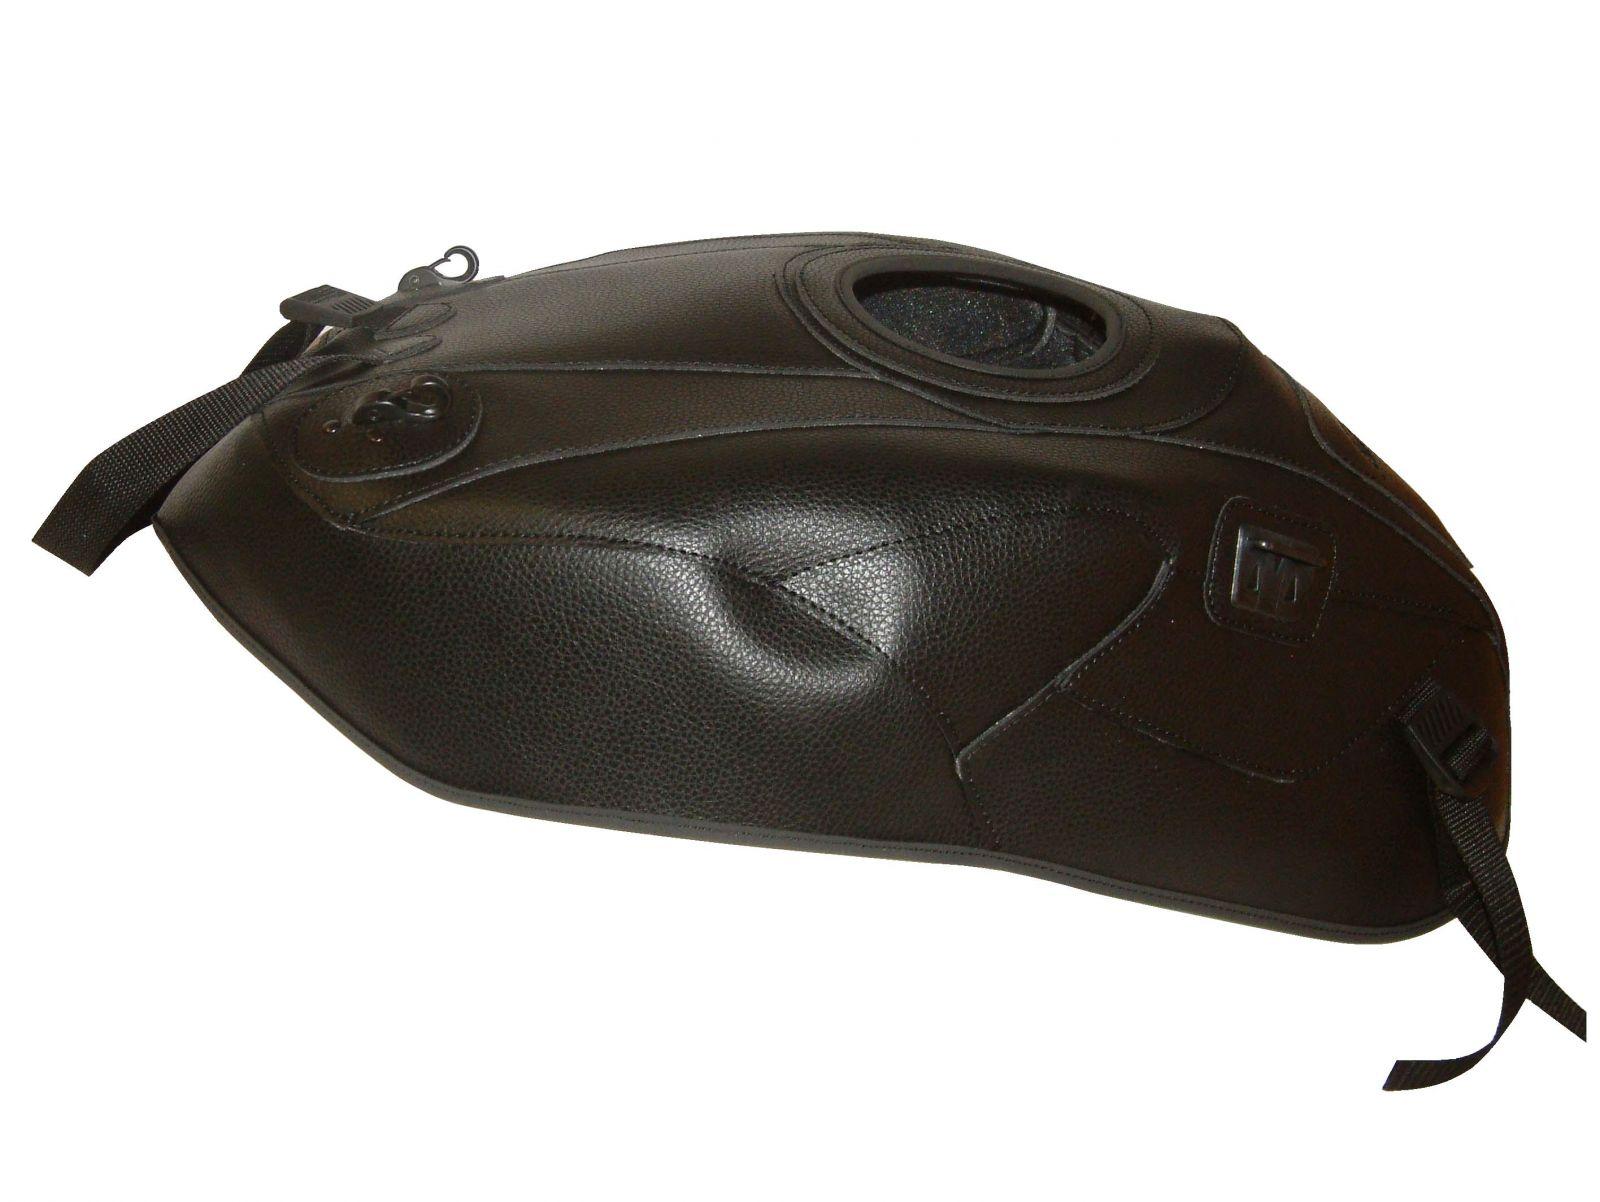 Capa de depósito TPR5993 - YAMAHA YZF R1 [2009-2010]